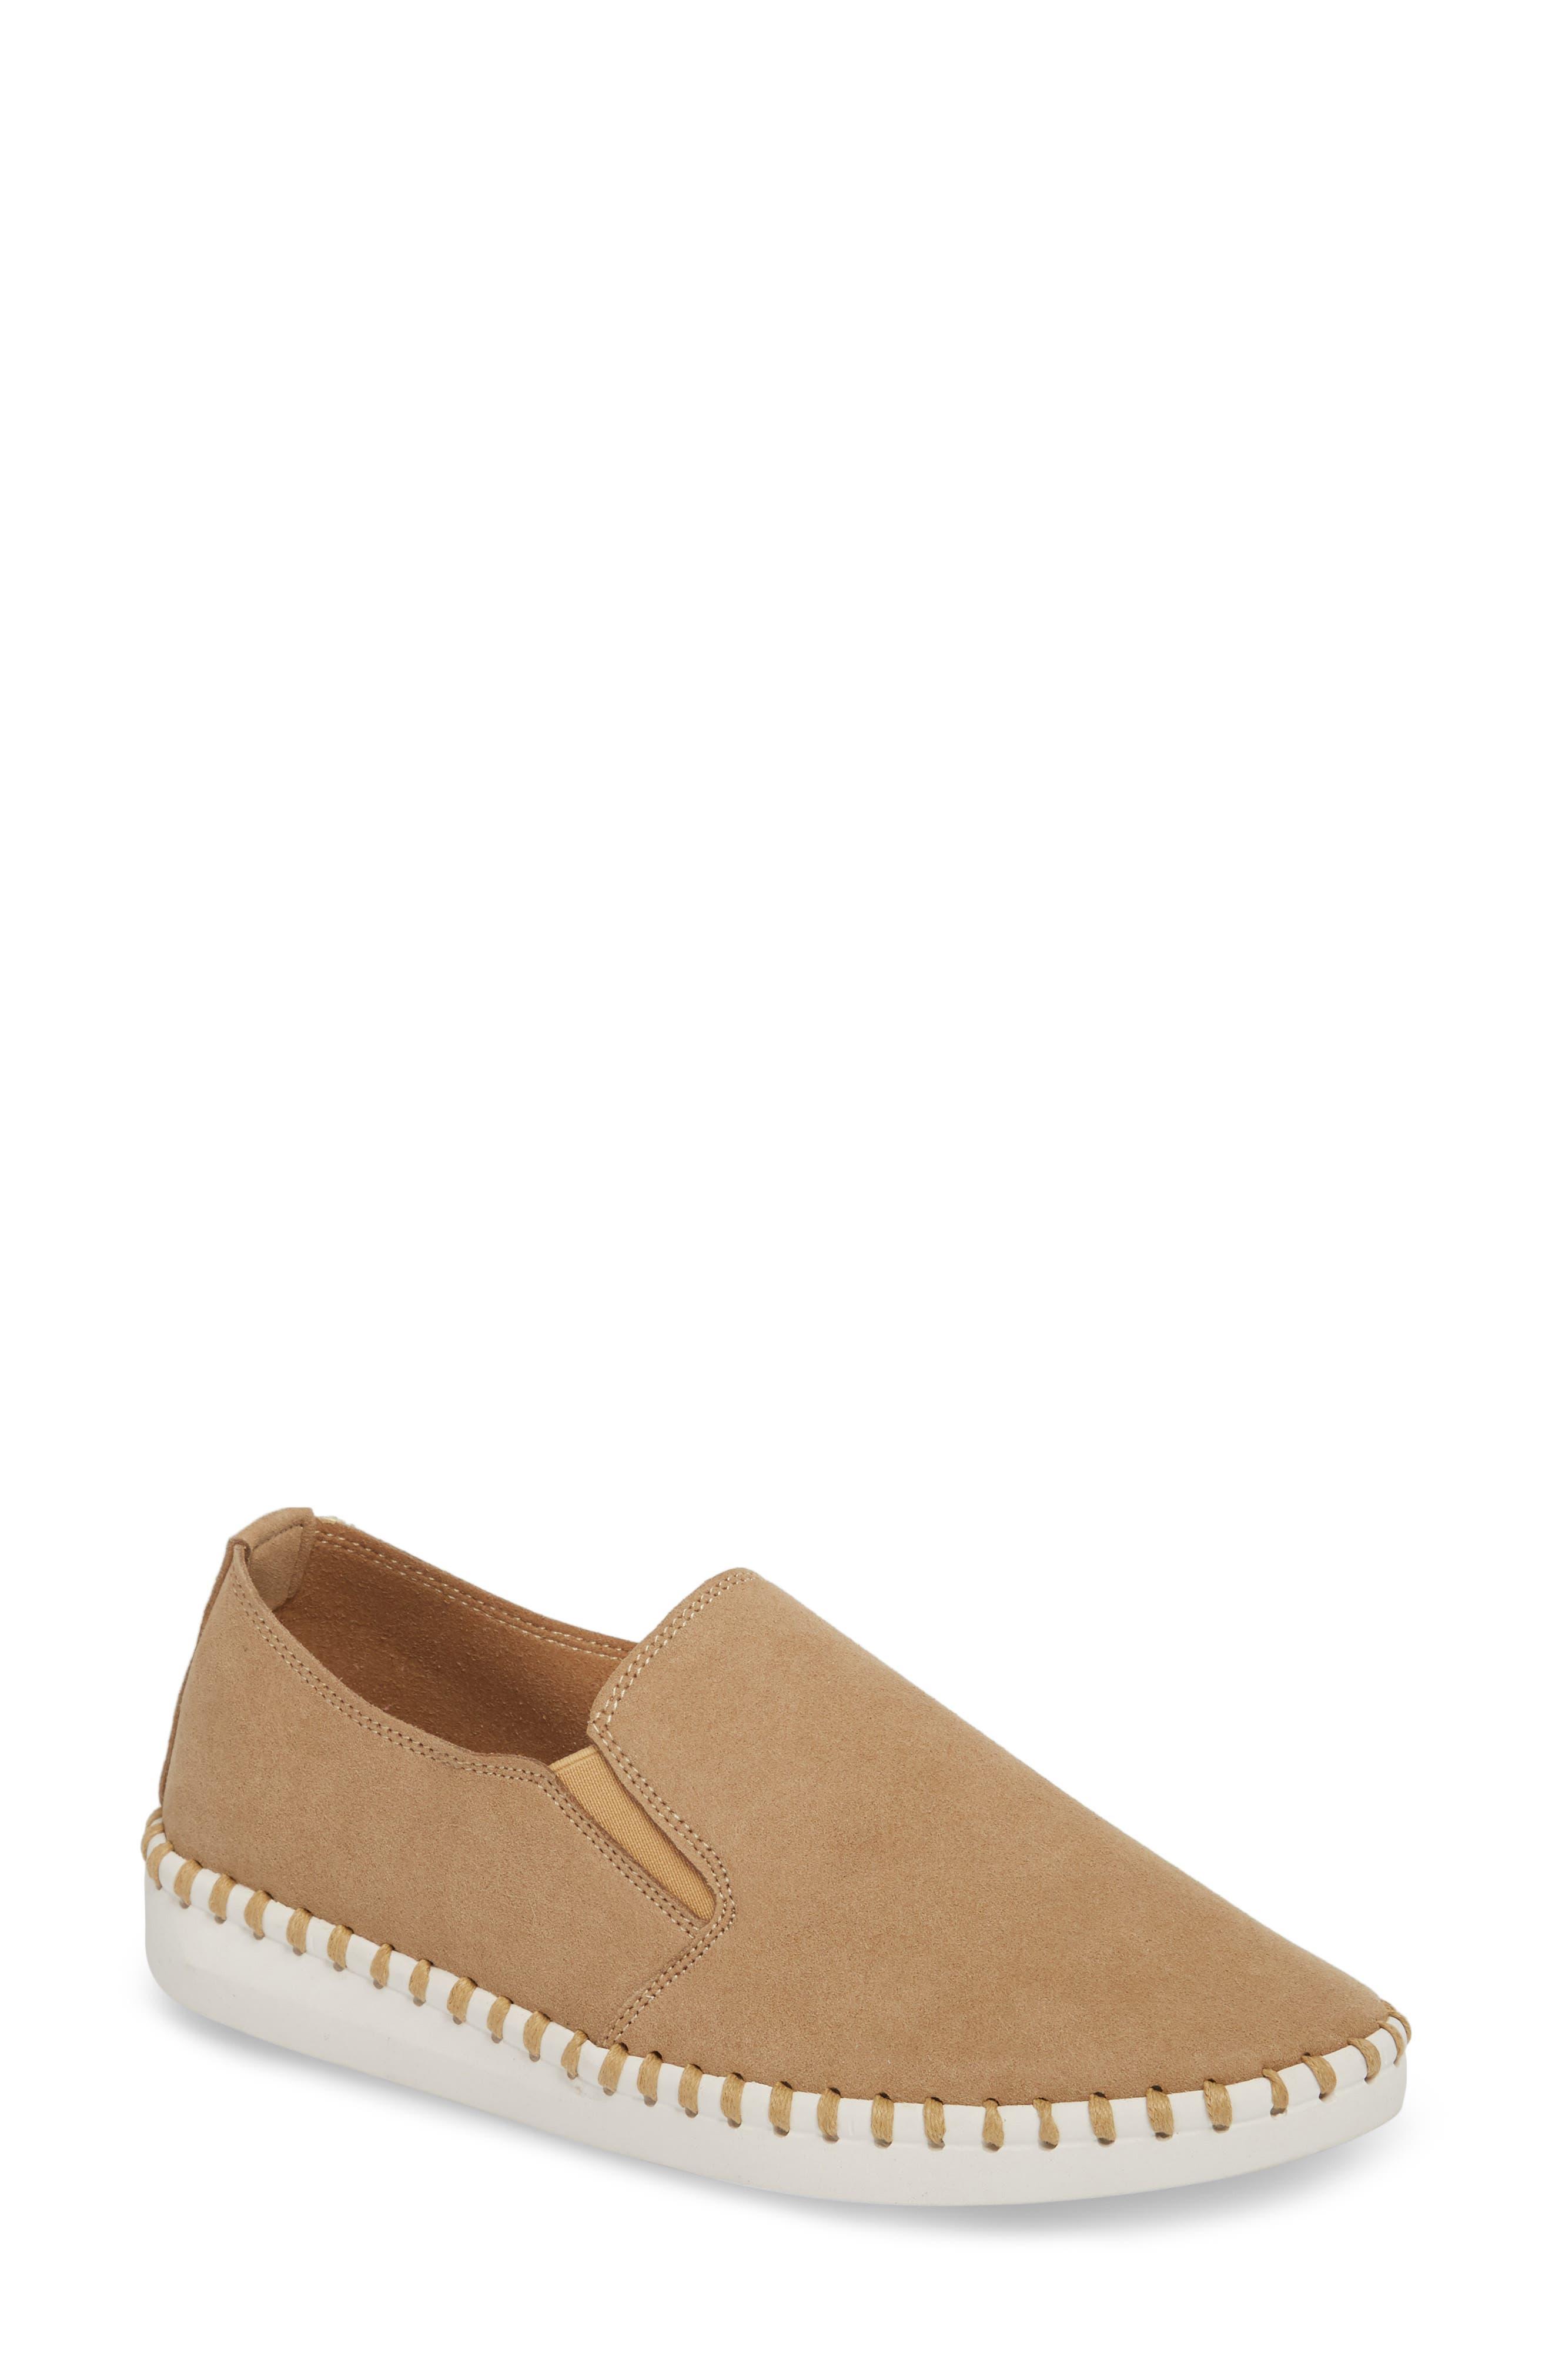 DÄV, Salinas Waterproof Slip-On Sneaker, Main thumbnail 1, color, TAN FABRIC